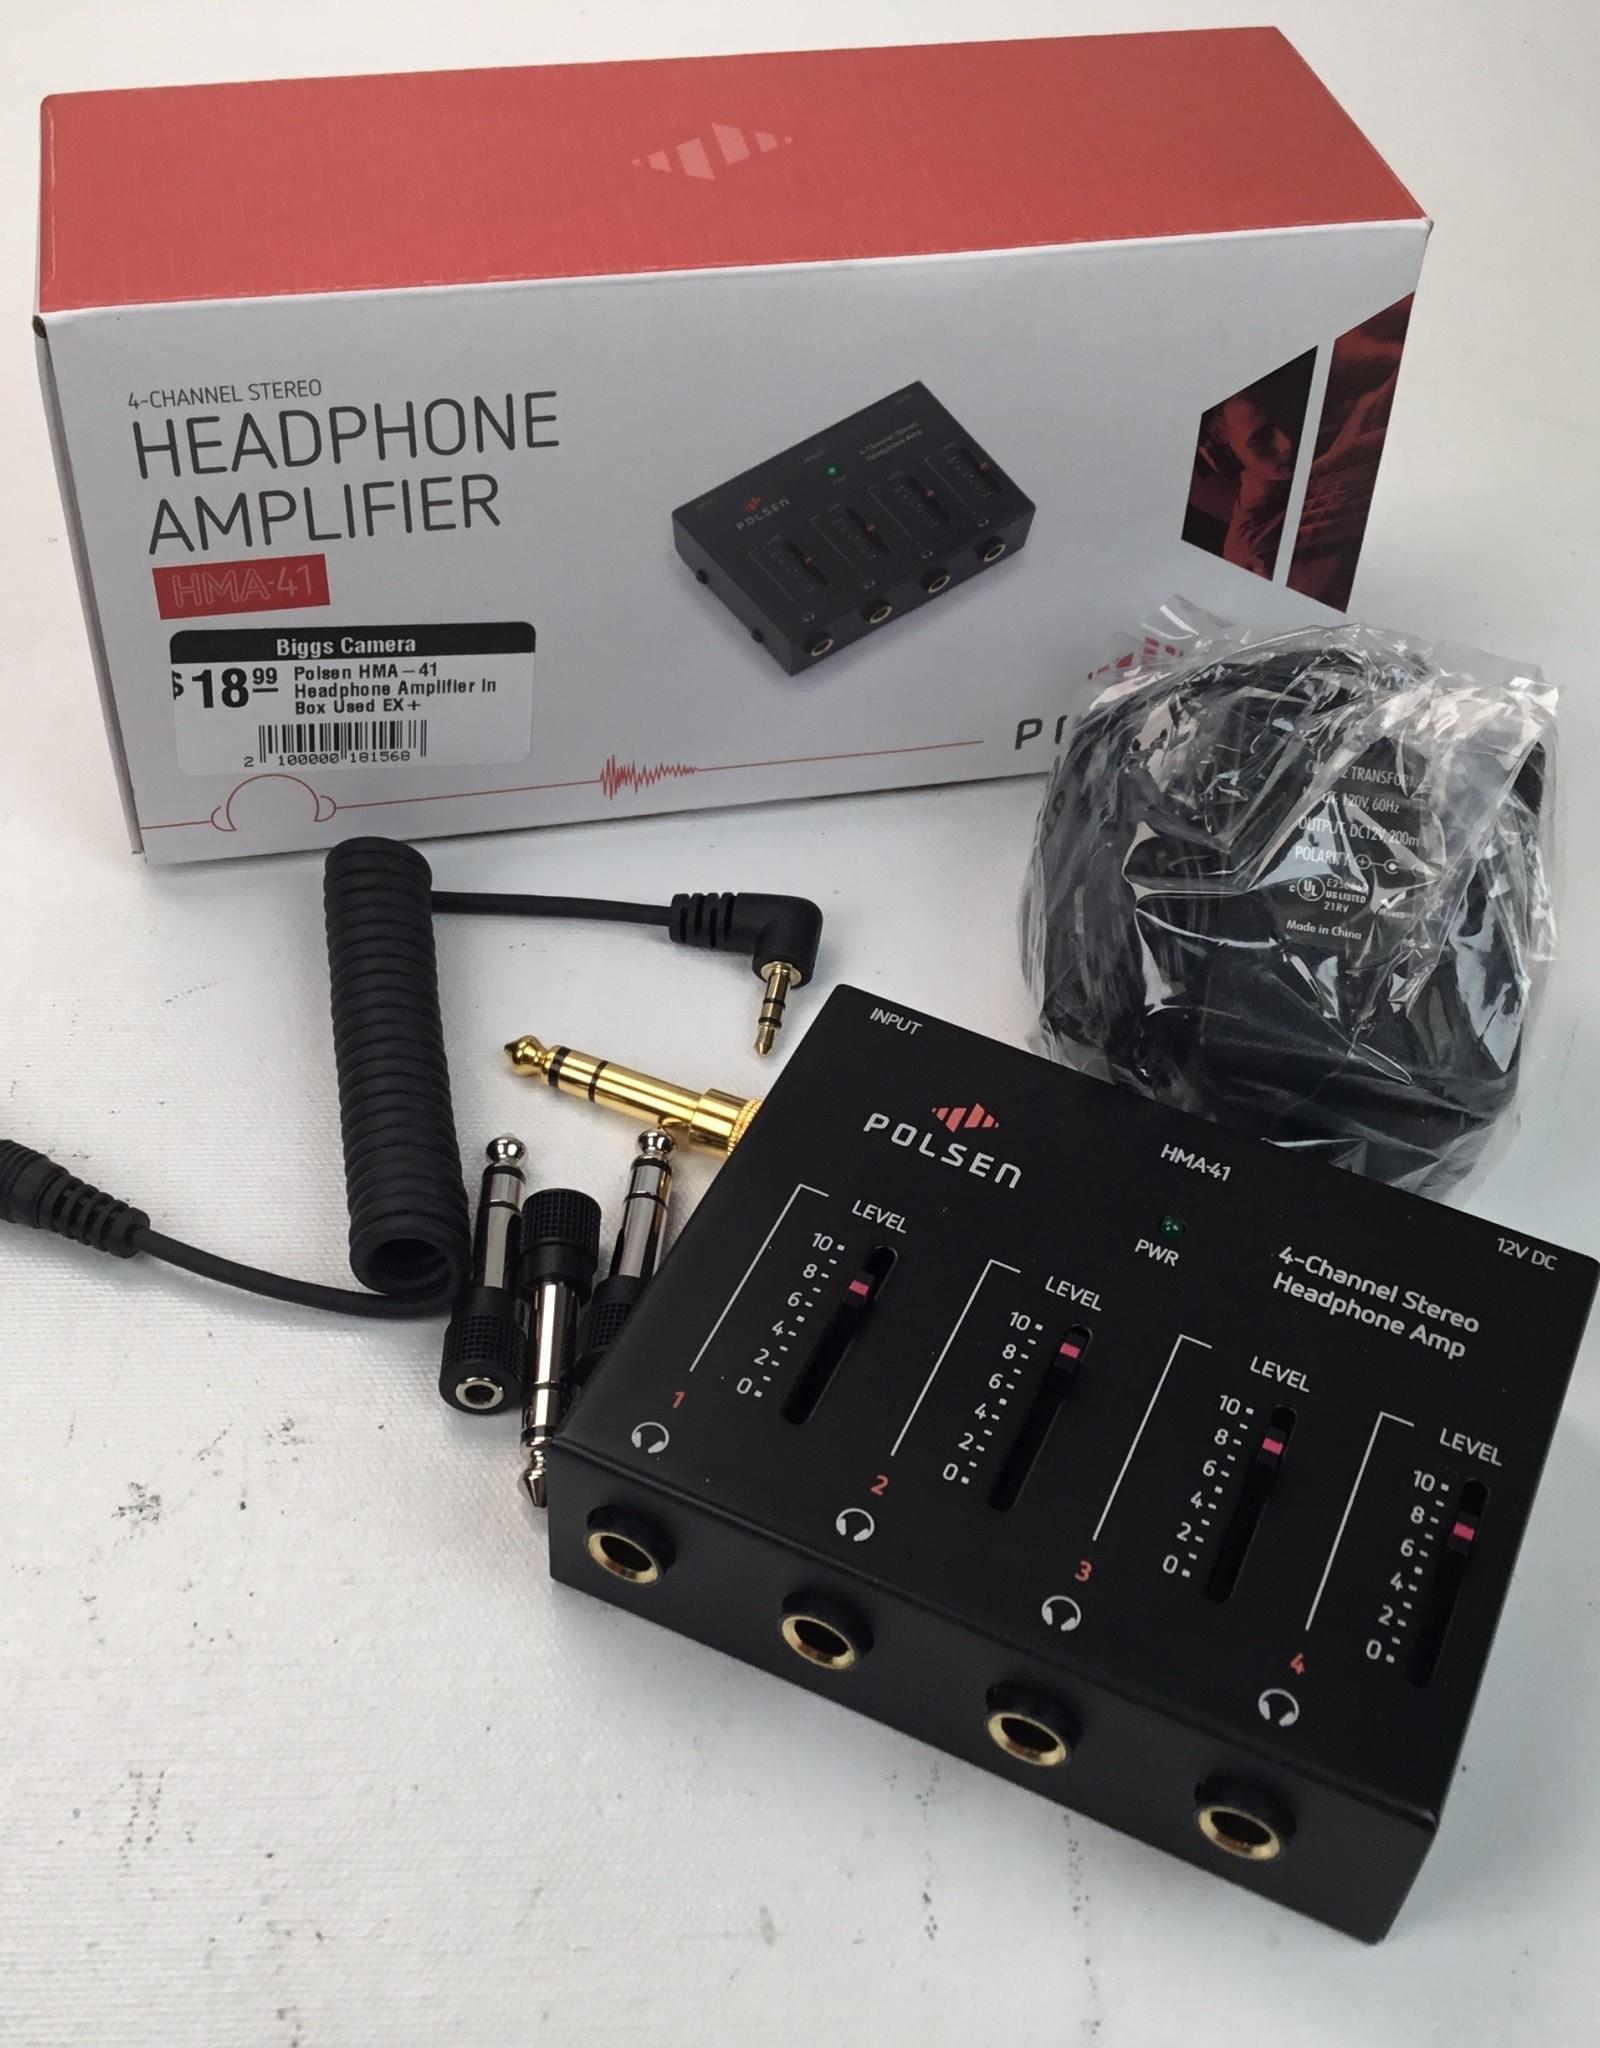 Polsen HMA-41 Headphone Amplifier in Box Used EX+